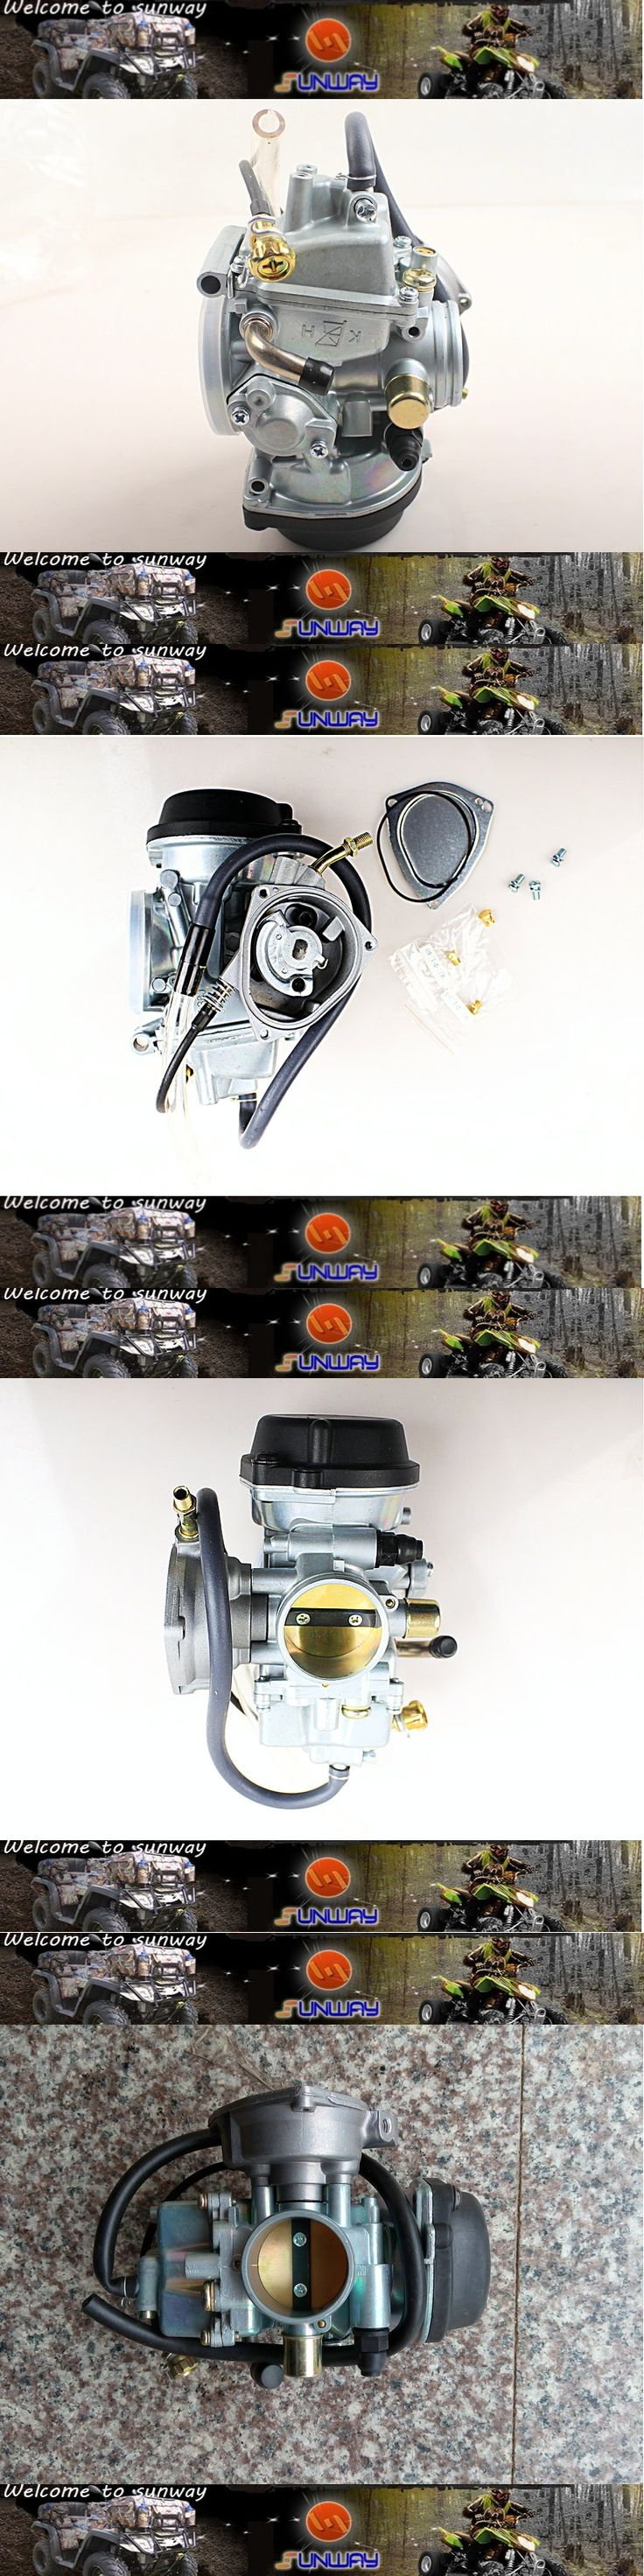 SUNWAY ATV Parts Carburetor PD36J for ODS LZ400 CF500 YFM 400 YFM500 KFX400 LTZ400 ATVs UTVs Free Shipping by epacket